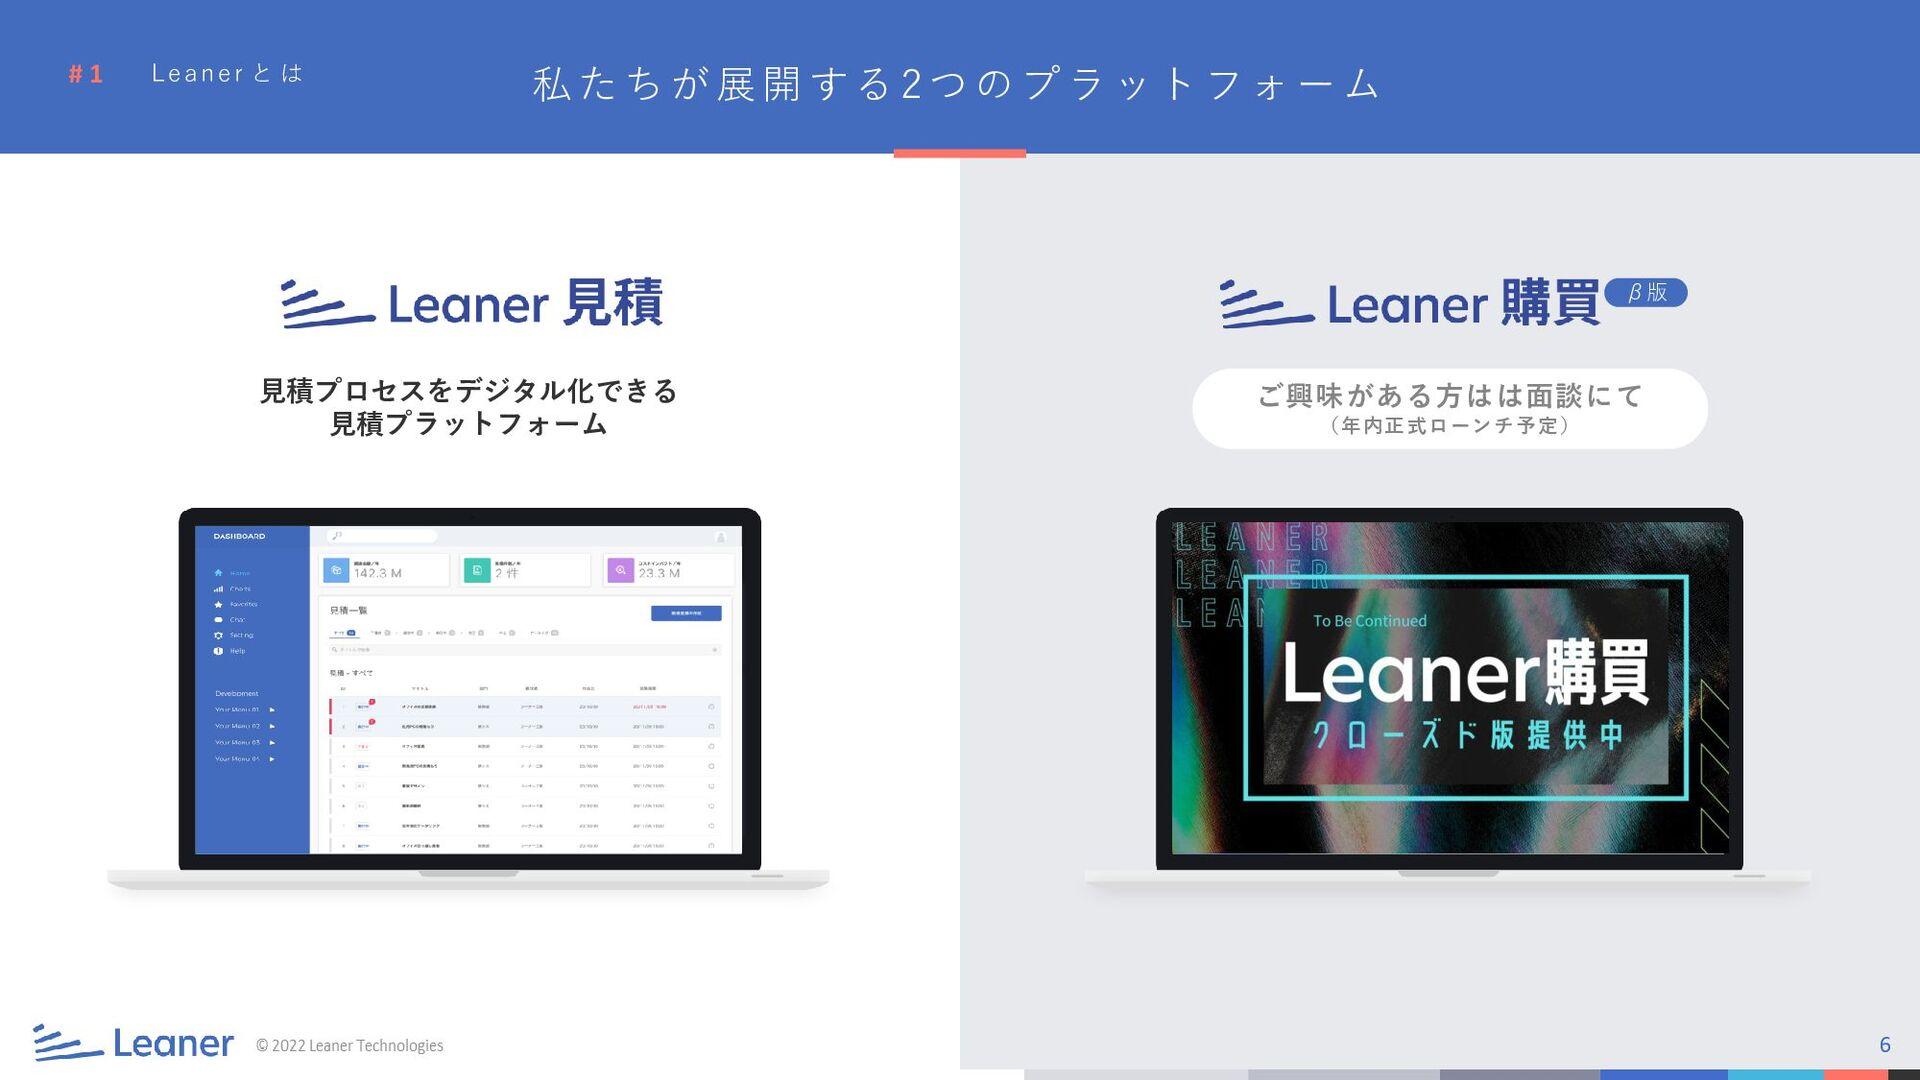 6 Adviser # 1 Leaner Adviser Shuzo Narita Advis...